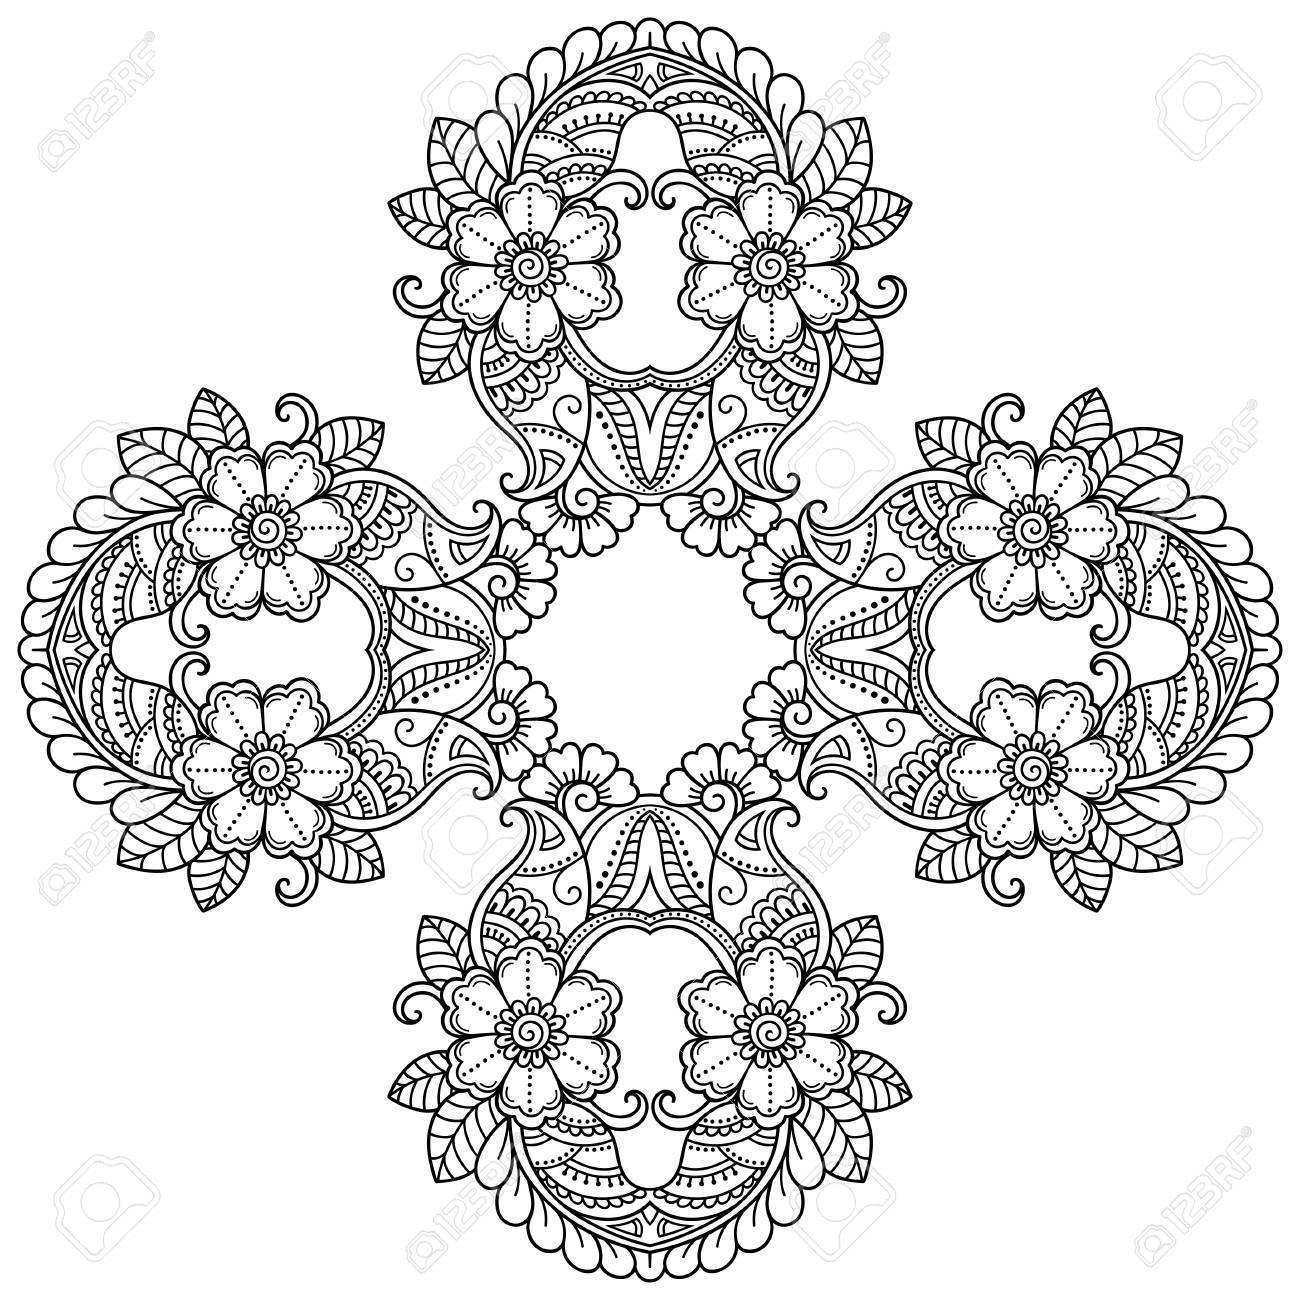 henna tattoo mandala in mehndi stil muster fr malbuch hand gezeichnet vektor illustration - Henna Tattoo Muster